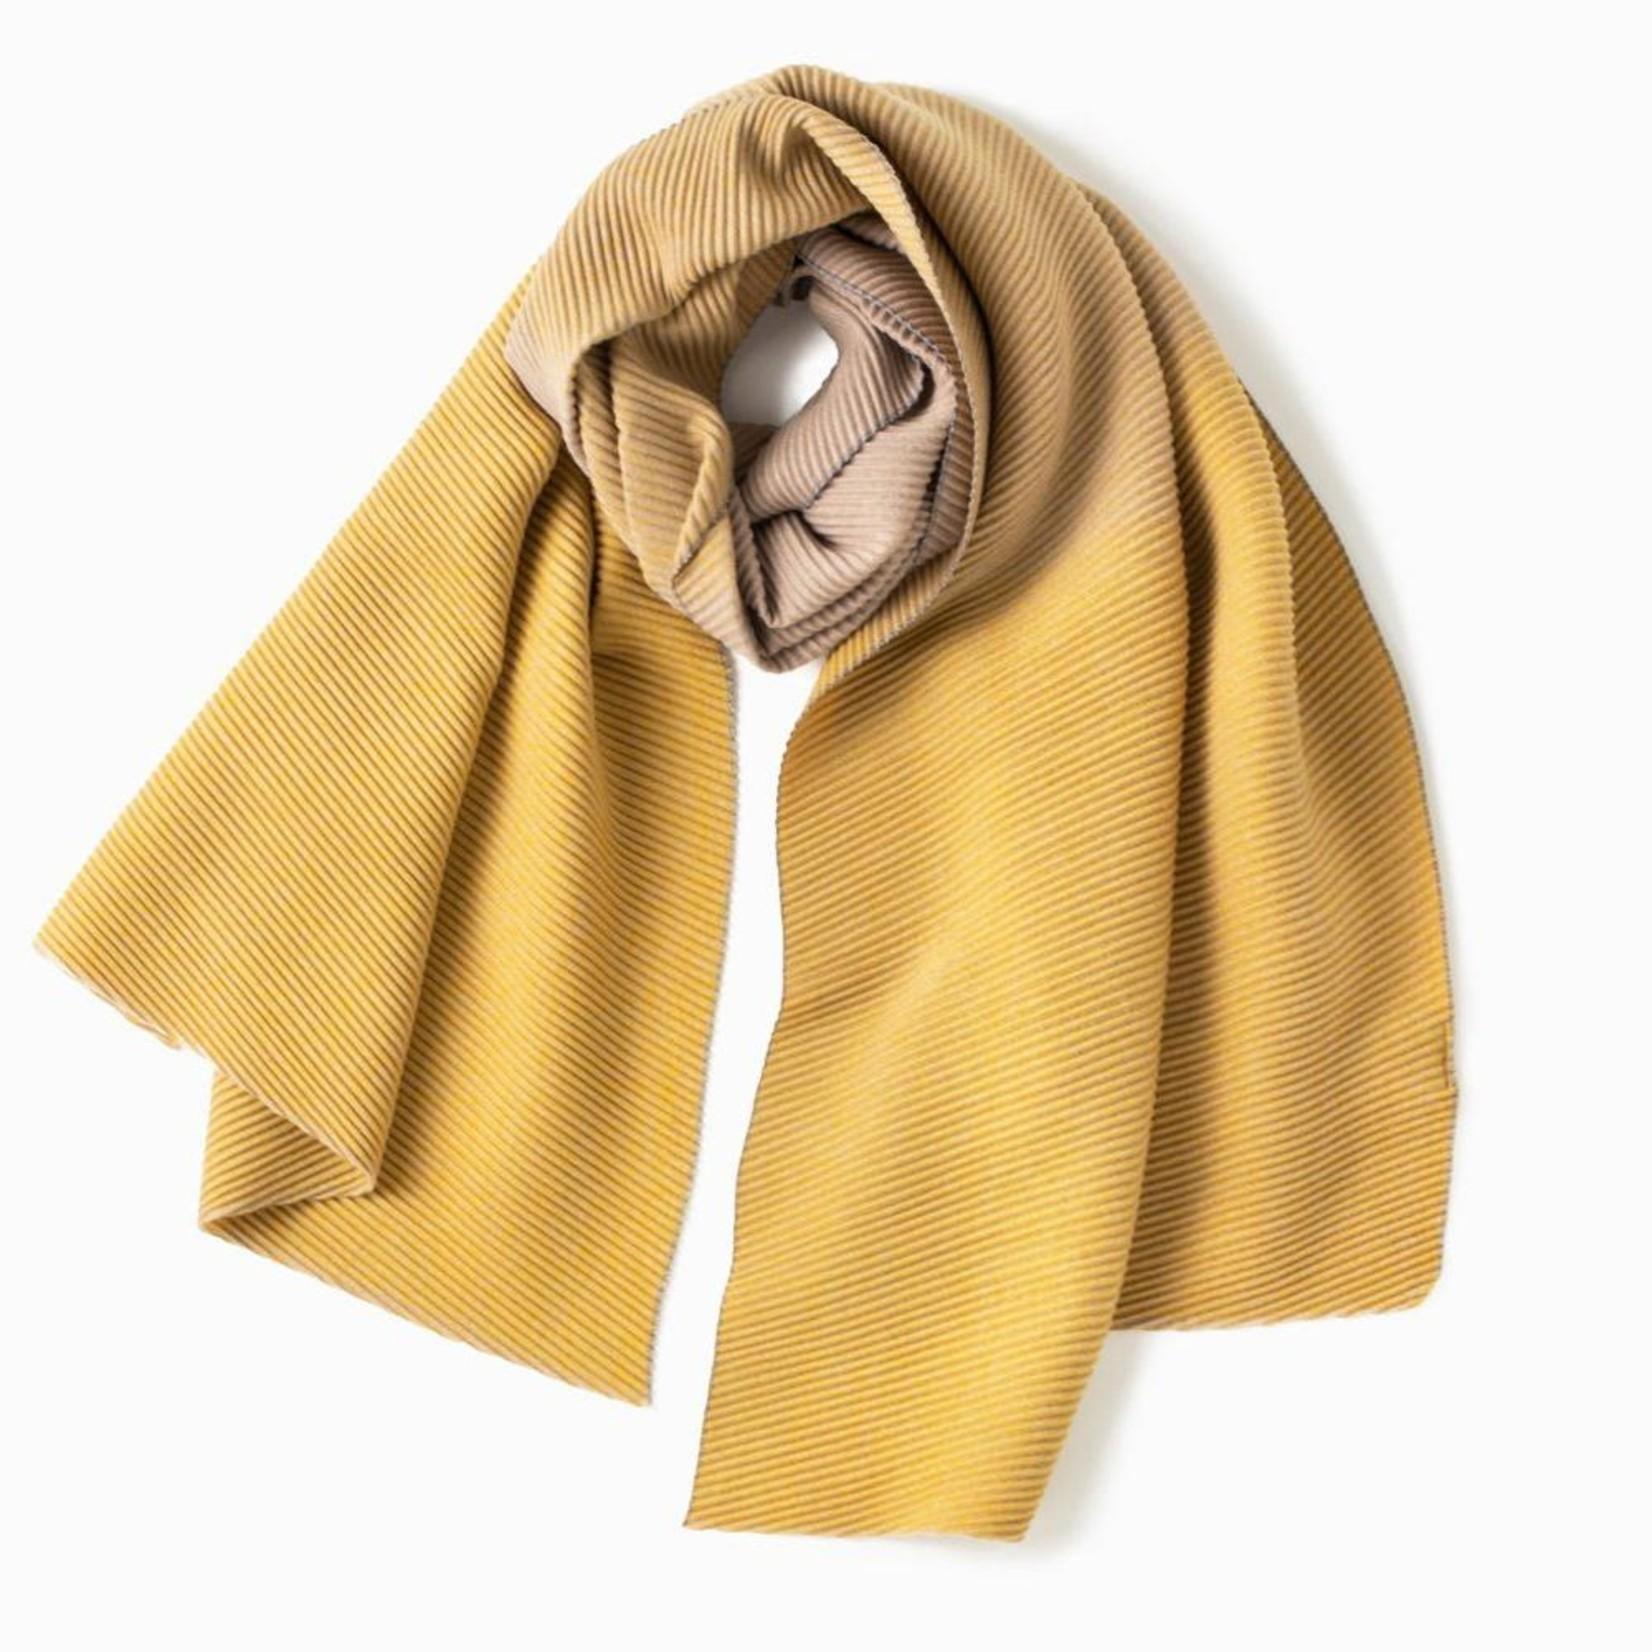 Look By M Gradient Pleats Scarf in Mustard